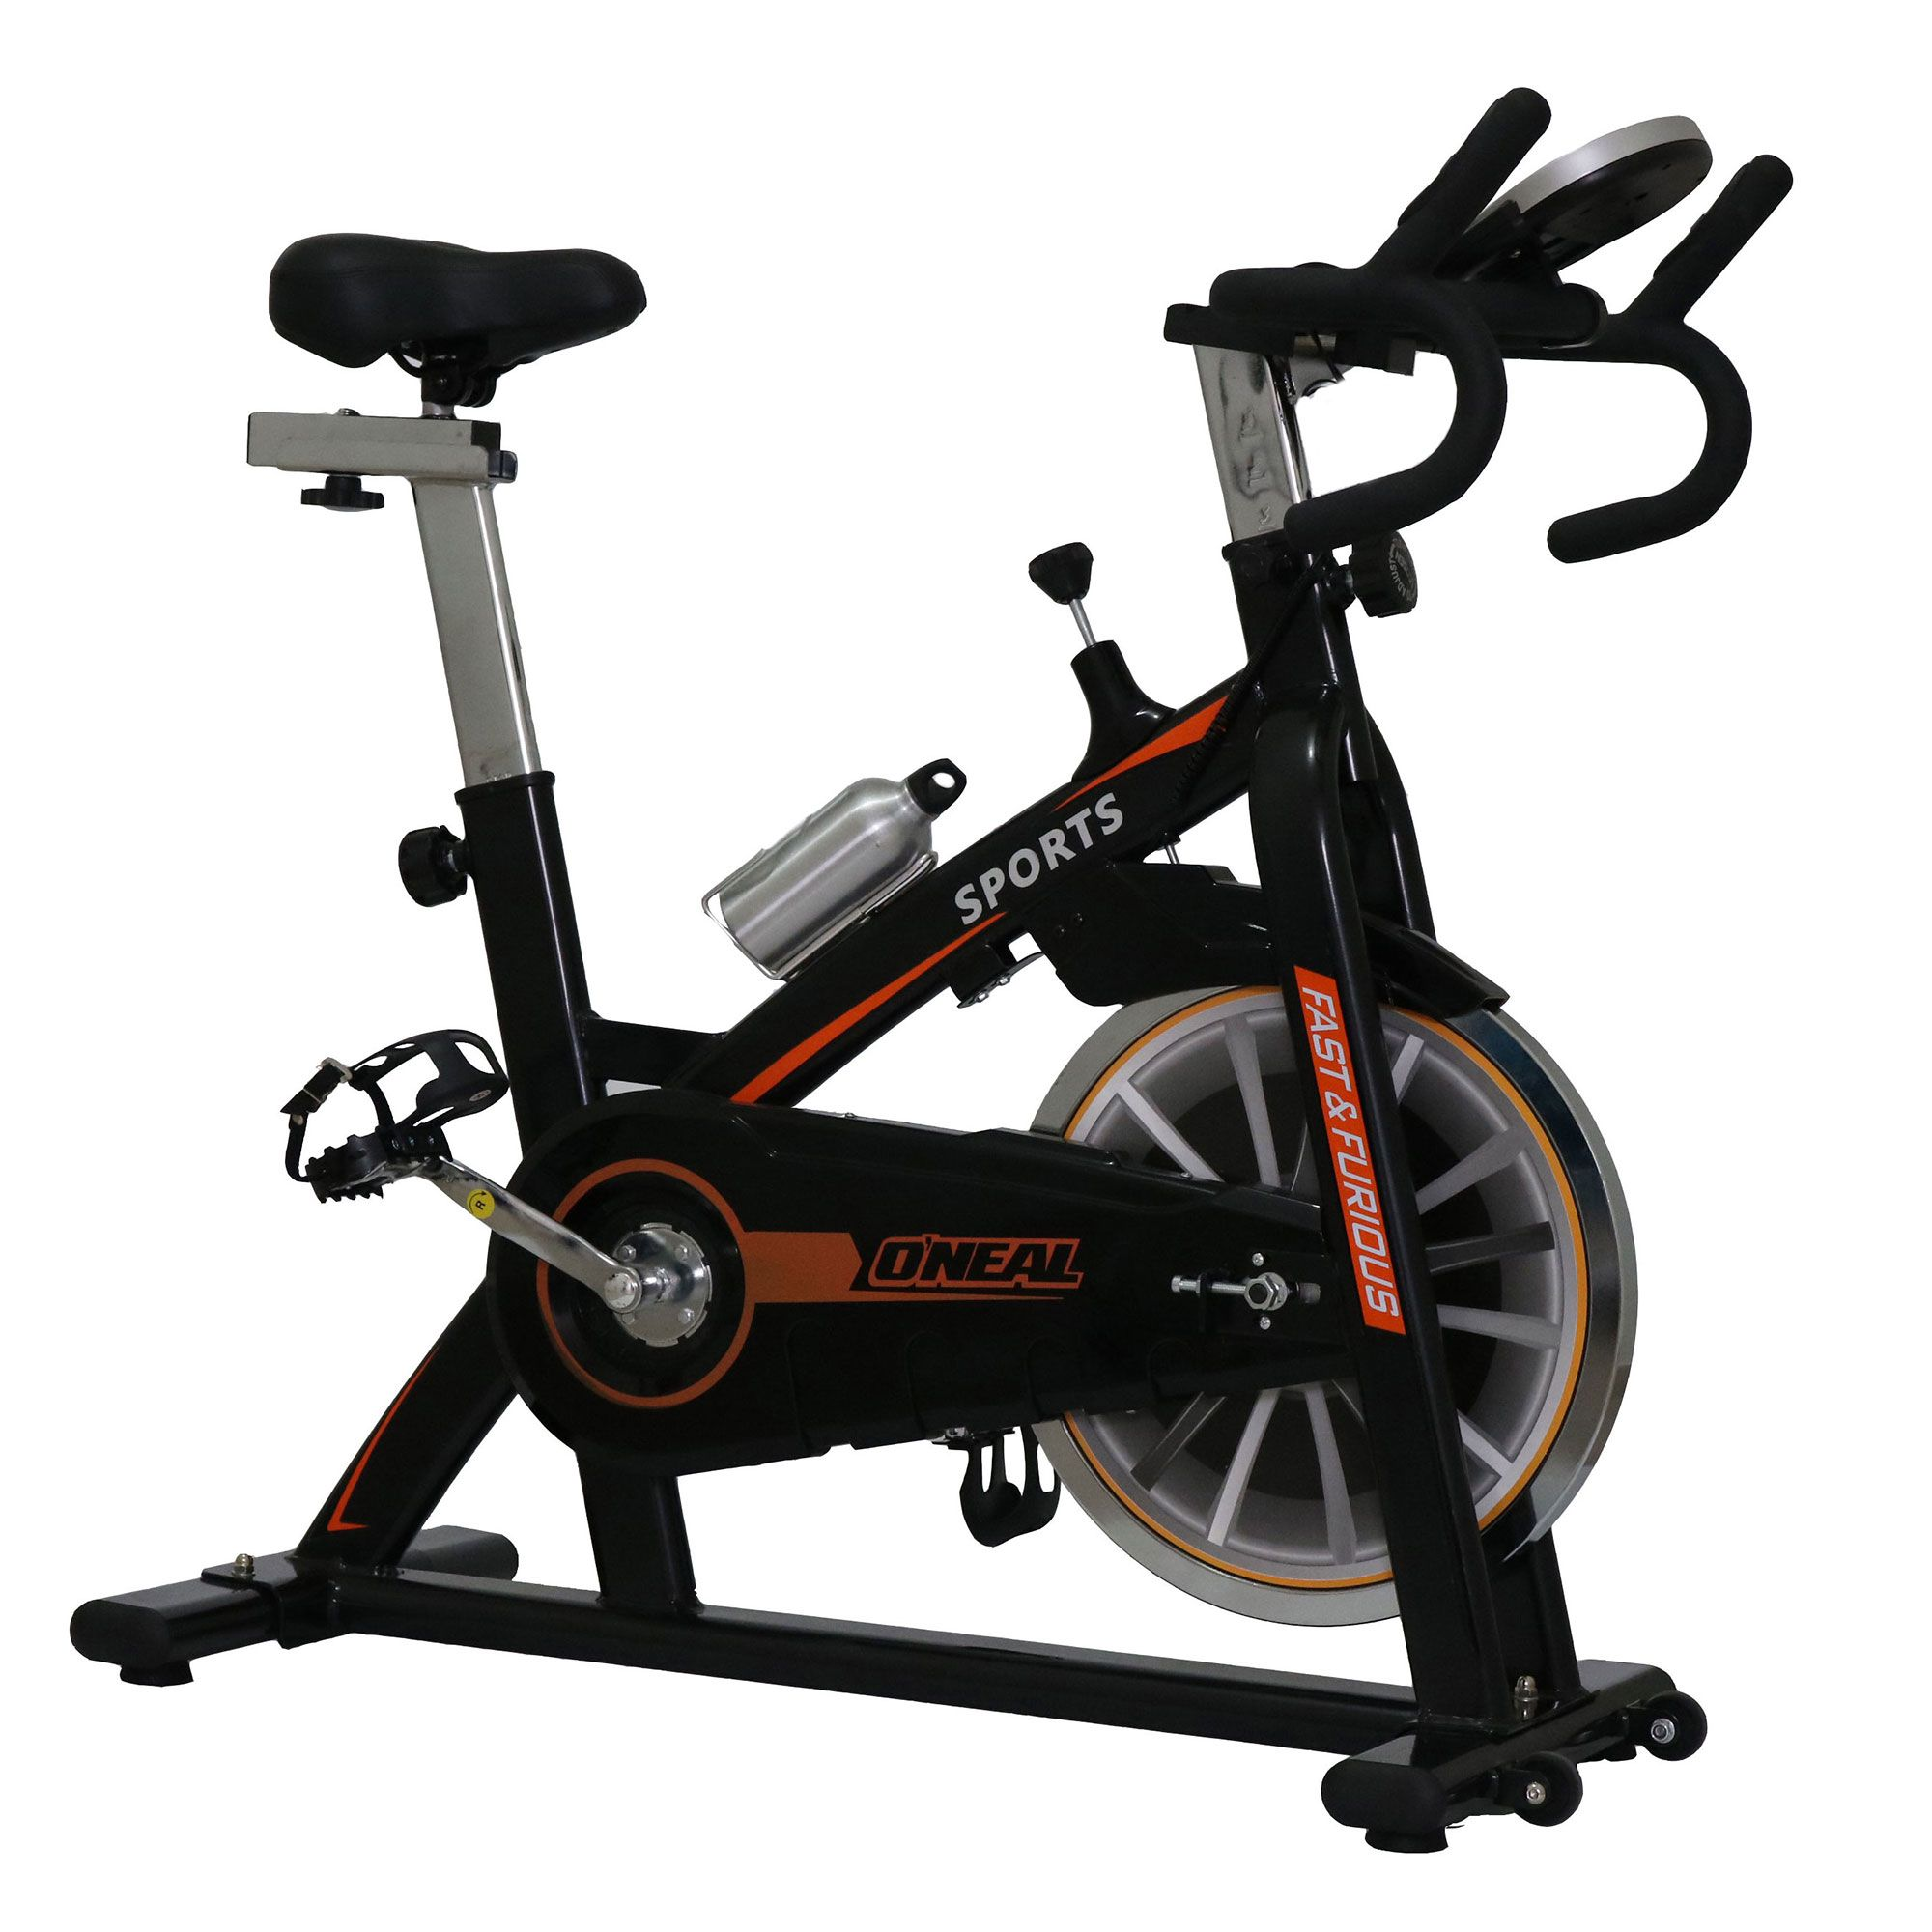 Bicicleta ergometrica spinning preta 120kg oneal tp1100